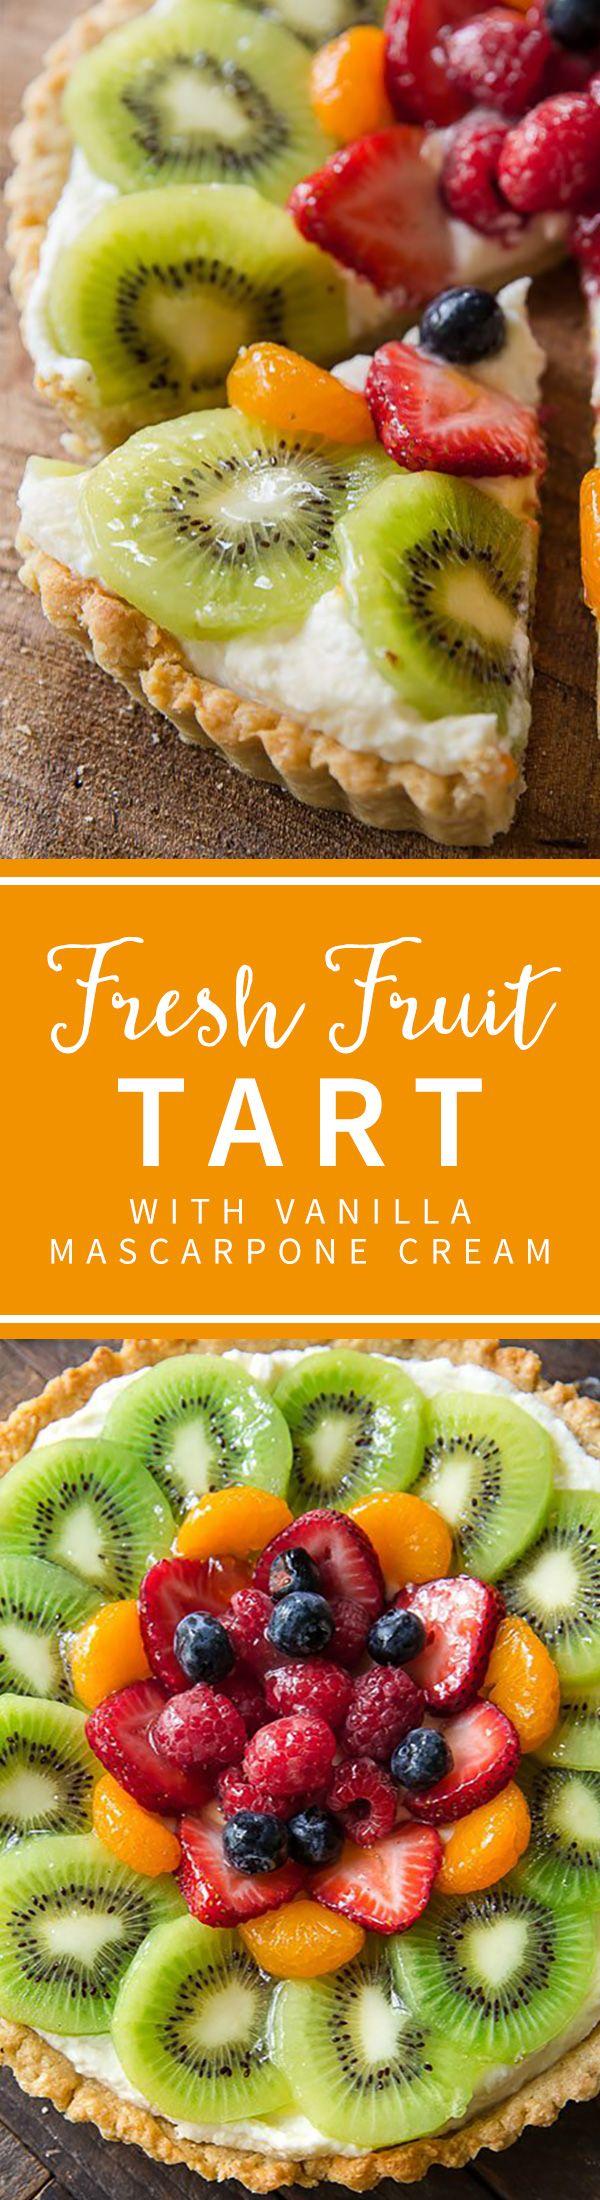 Delicious summer dessert! Fresh fruit pastry tart with mascarpone cream filling!! Recipe on sallysbakingaddiction.com